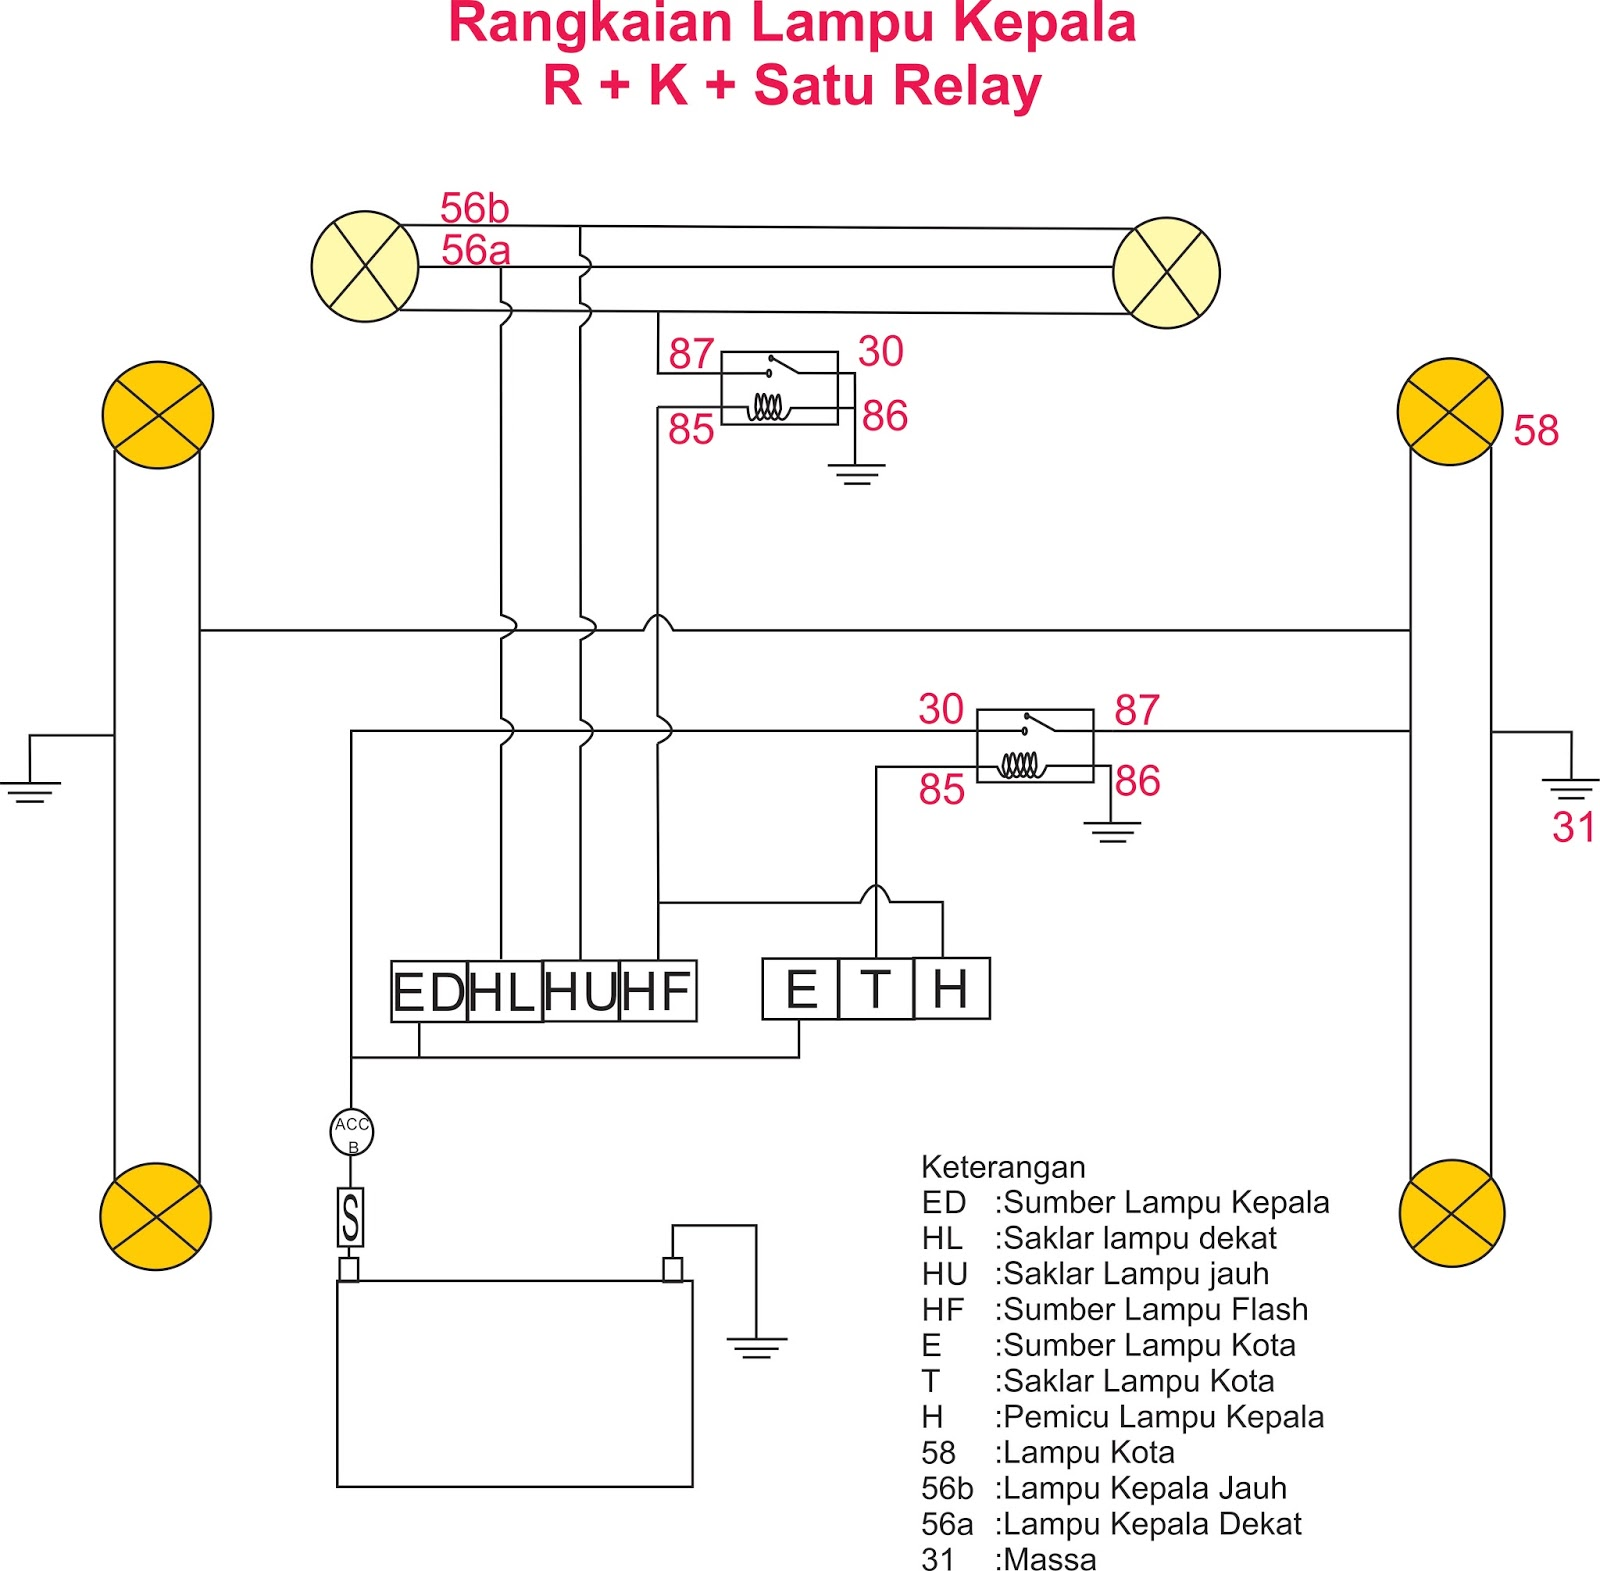 Wiring Kelistrikan Lampu Kepala New Model Wiring Diagram